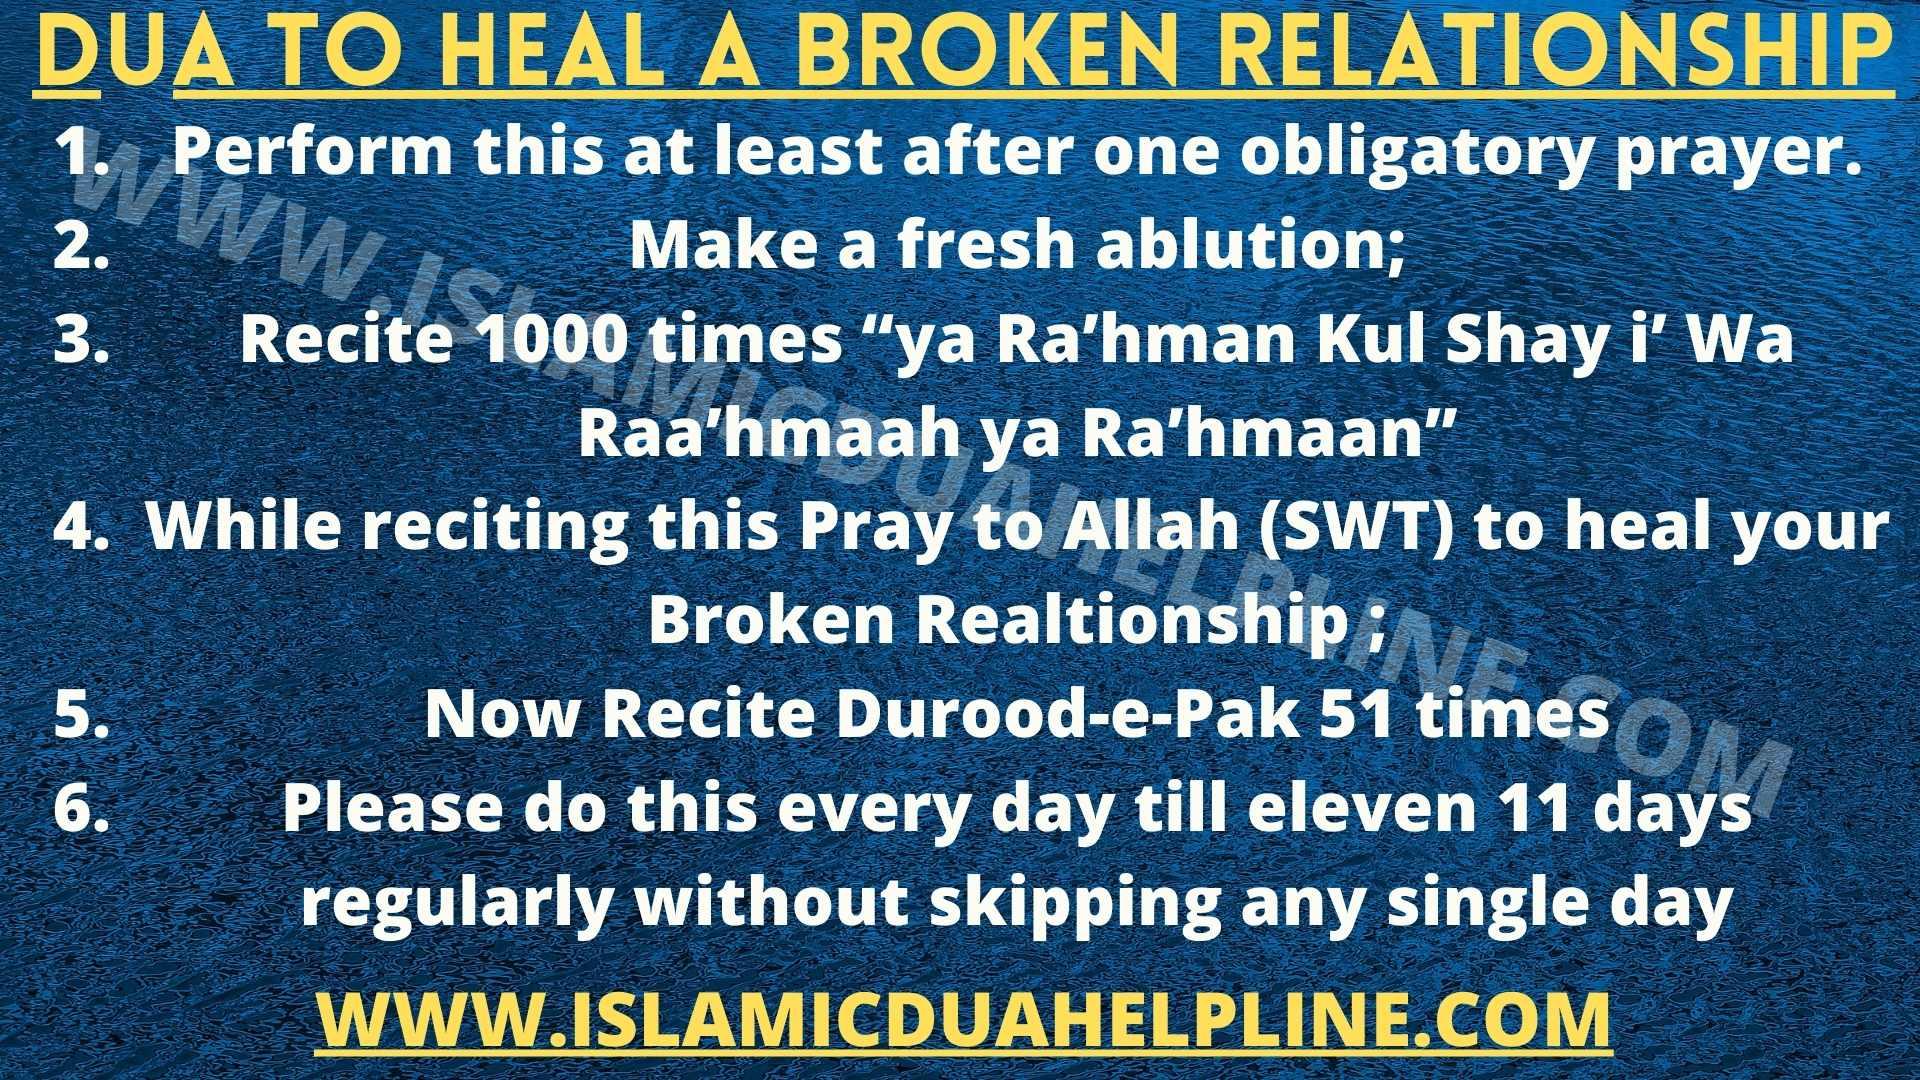 Dua to Heal a Broken Relationship